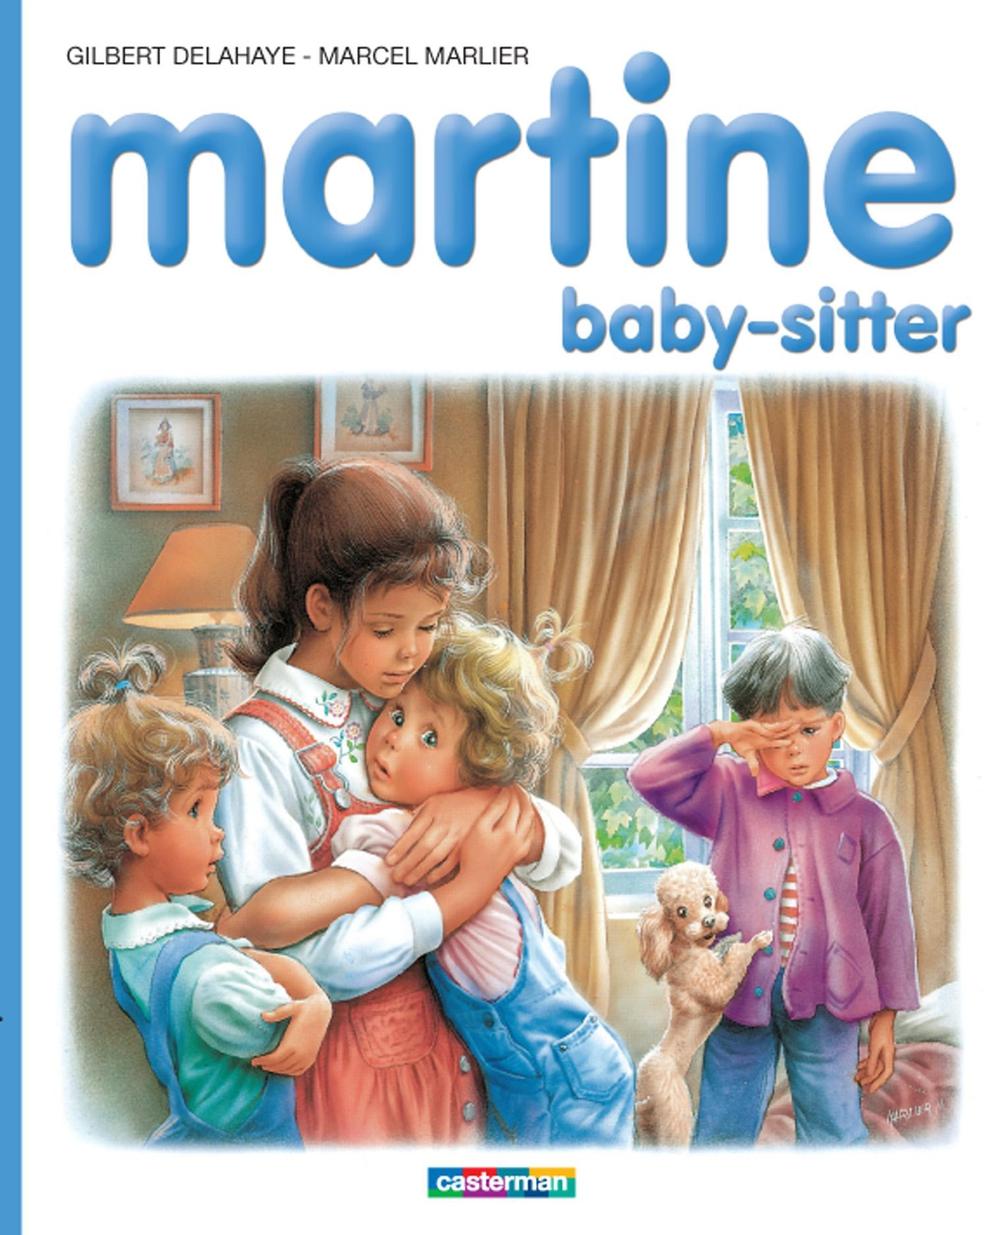 Couverture : Martine Baby-sitter #47 Gilbert/marlier Delahaye, Gilbert/marlier Delahaye